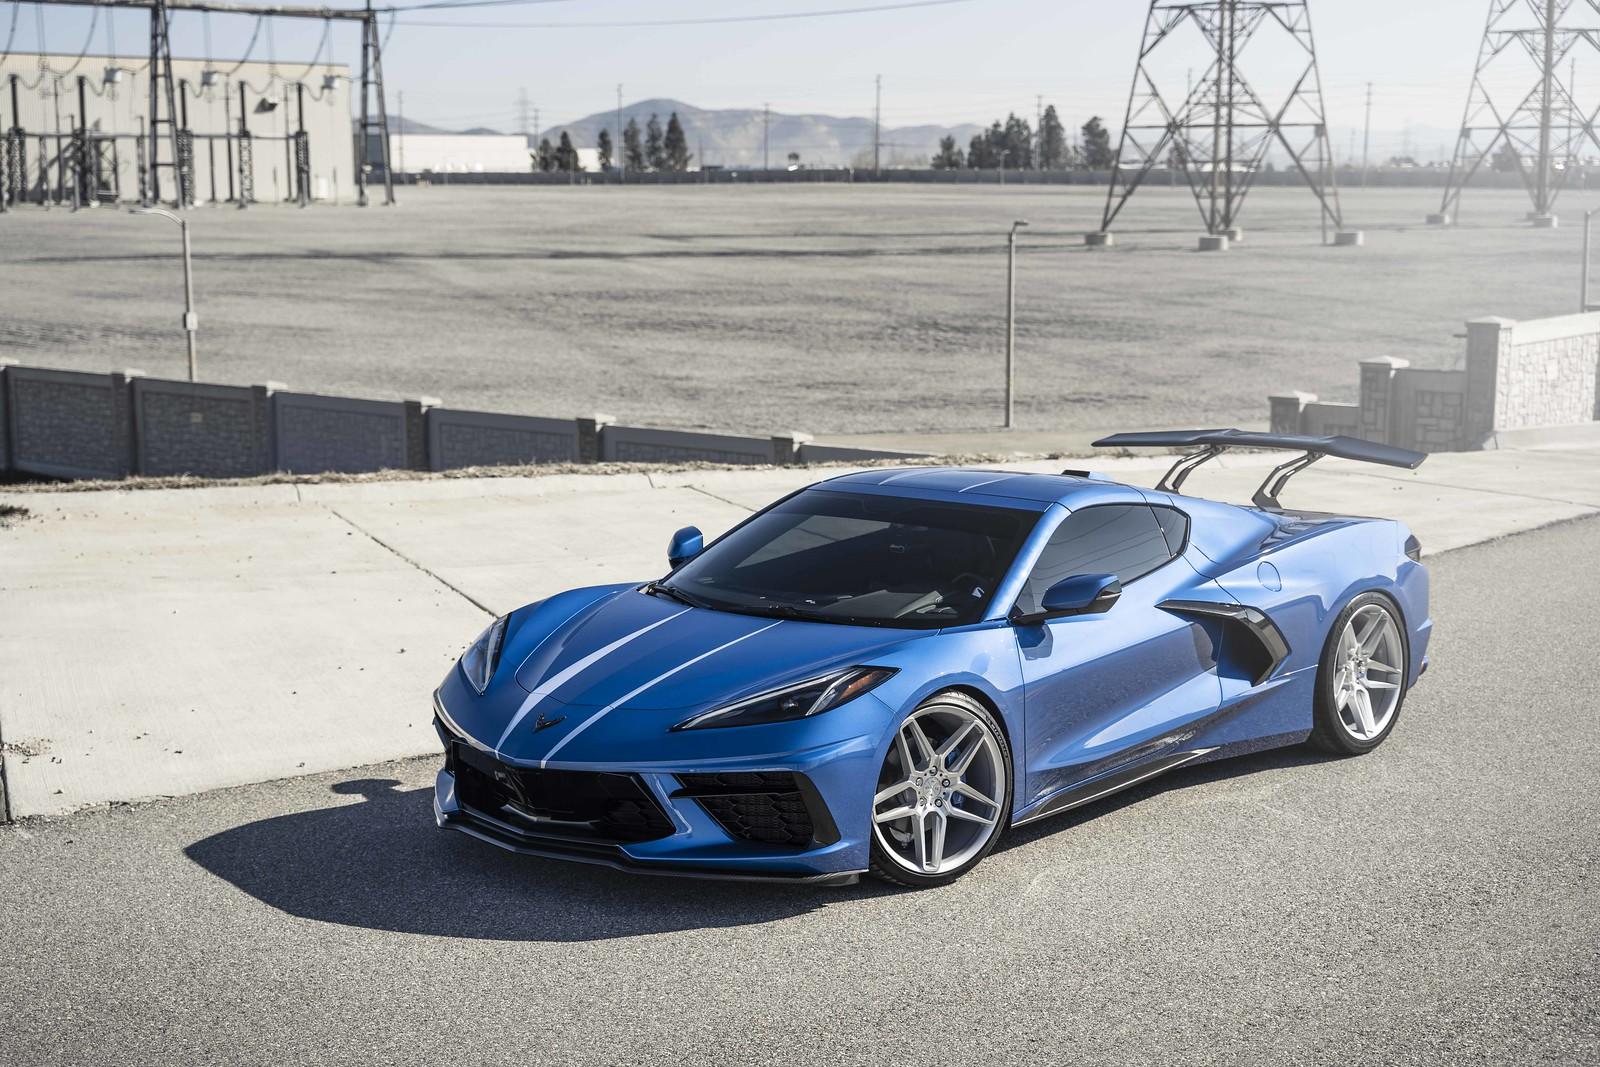 2020_Chevrolet_Corvette_C8_BD17_5_Silver_w-_Machined_Face_-24